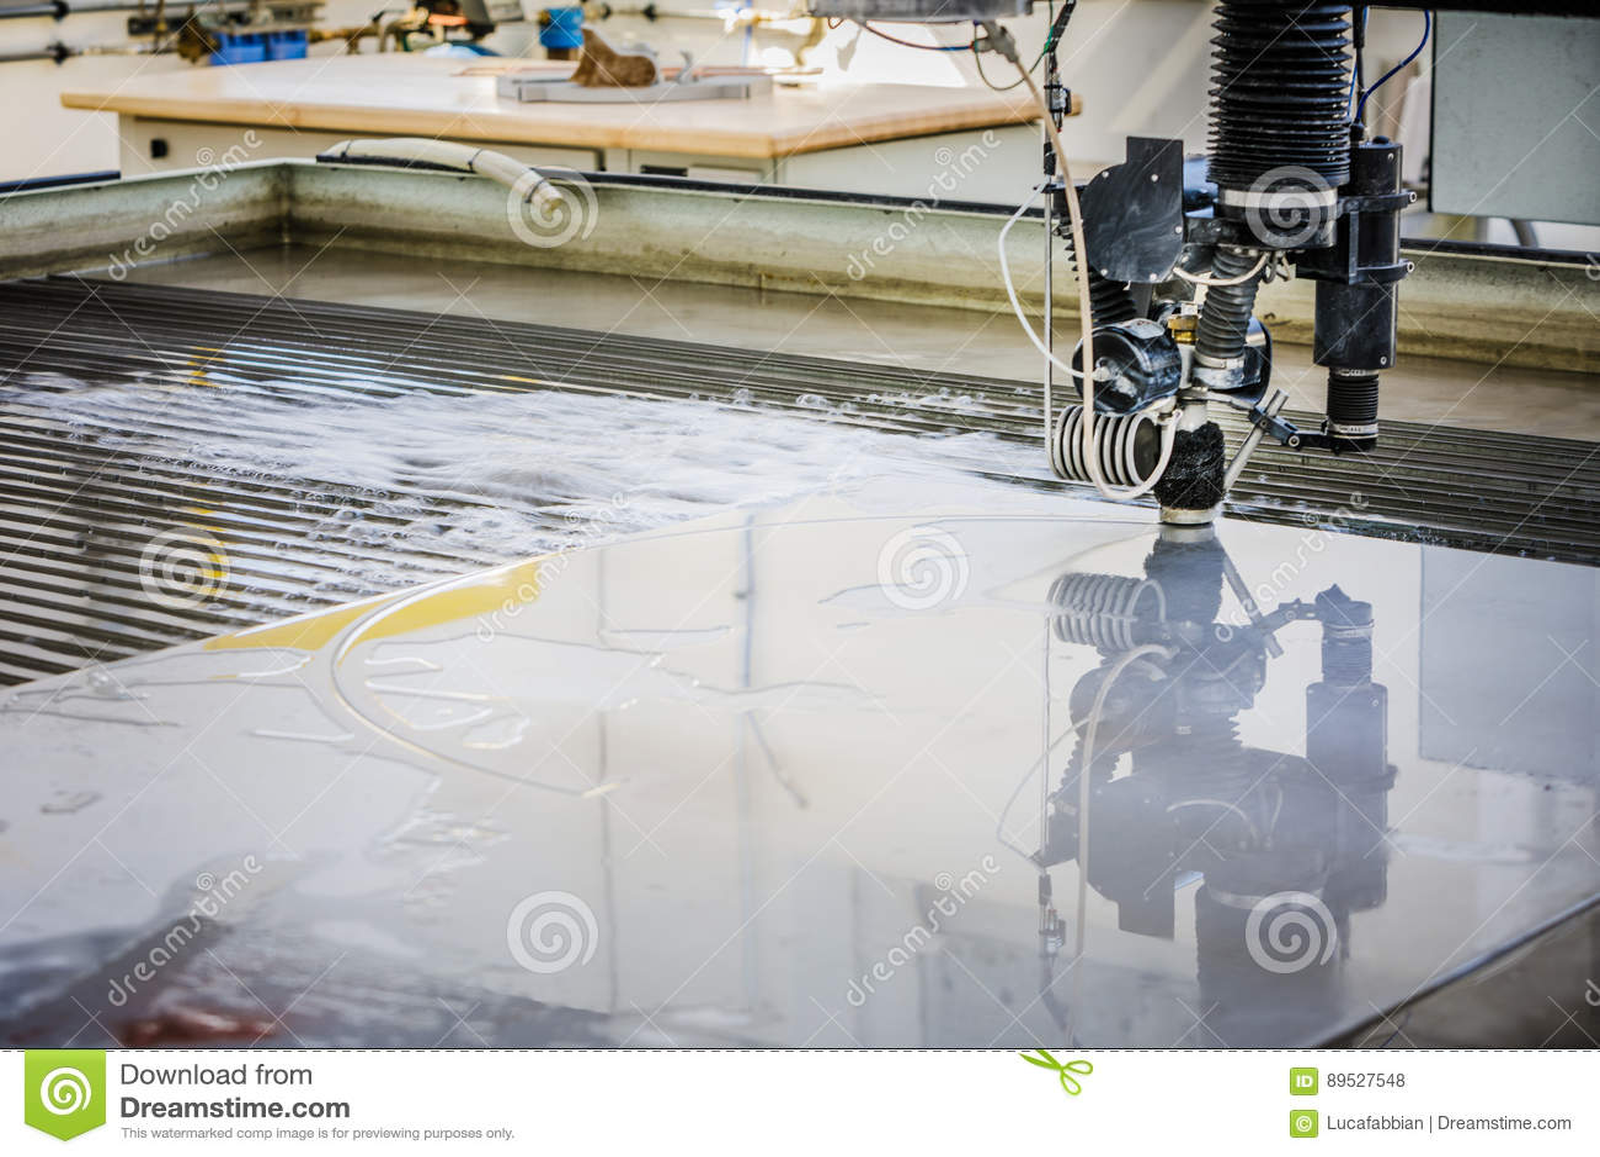 CNC Waterjet Cutting Machine Detail Stock Photo - Image of